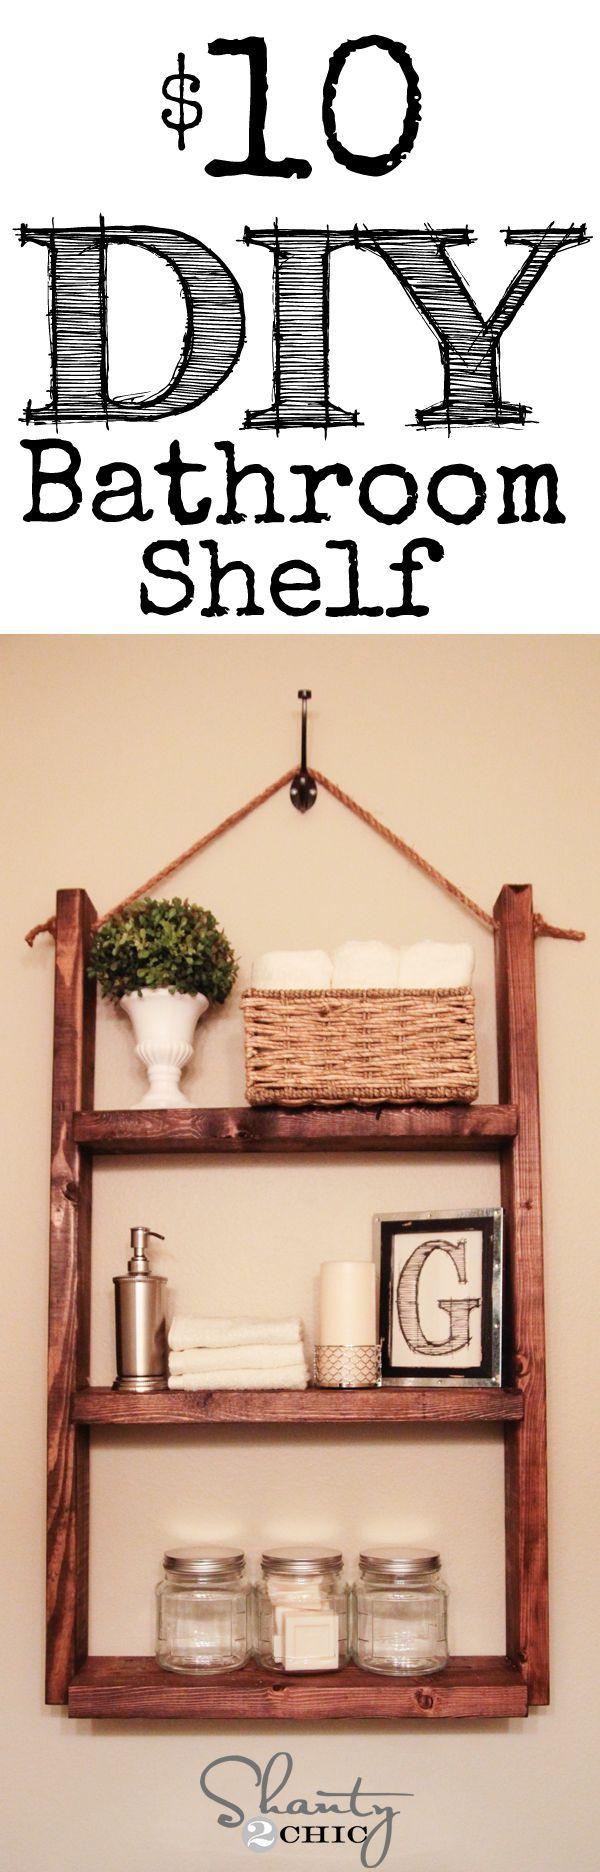 Super cute and easy Shelf for the bathroom! LOVE this idea!